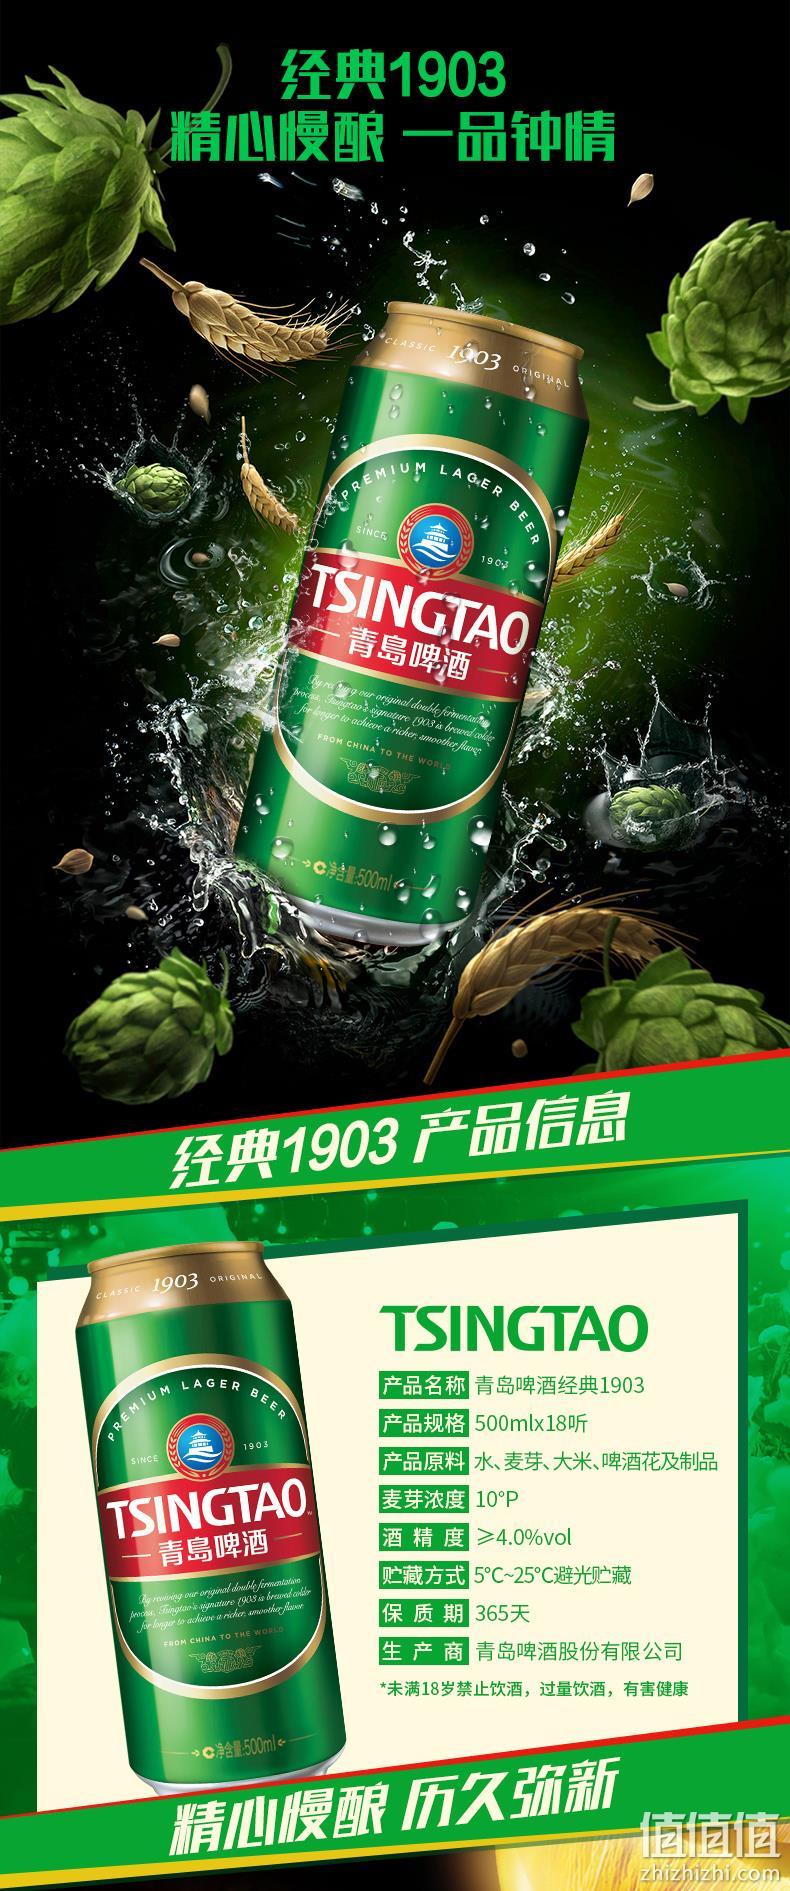 TSINGTAO 青岛啤酒 经典1903啤酒 500mlx18听 67元包邮 值值值-买手聚集的地方